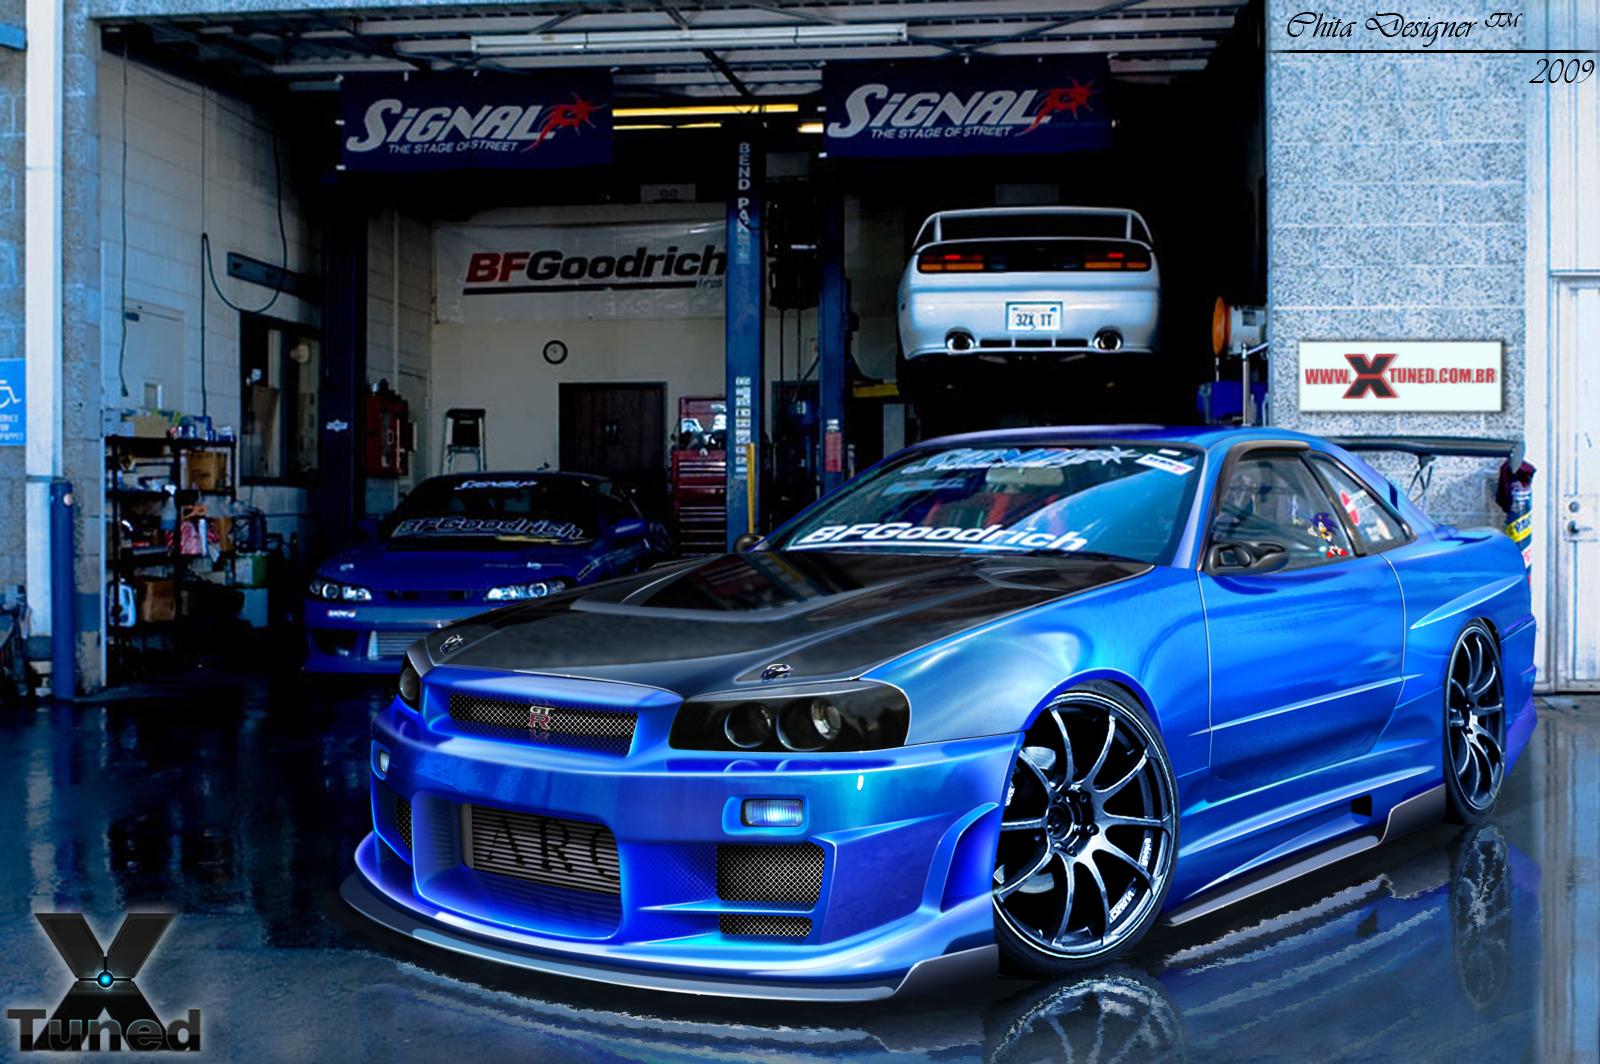 http://1.bp.blogspot.com/-1nEwcLFz3Y0/TclpOc3_6jI/AAAAAAAAAEA/x_Z4IhZB3kw/s1600/Nissan_Skyline_R34_GTR_by_ChitaDesigner.jpg